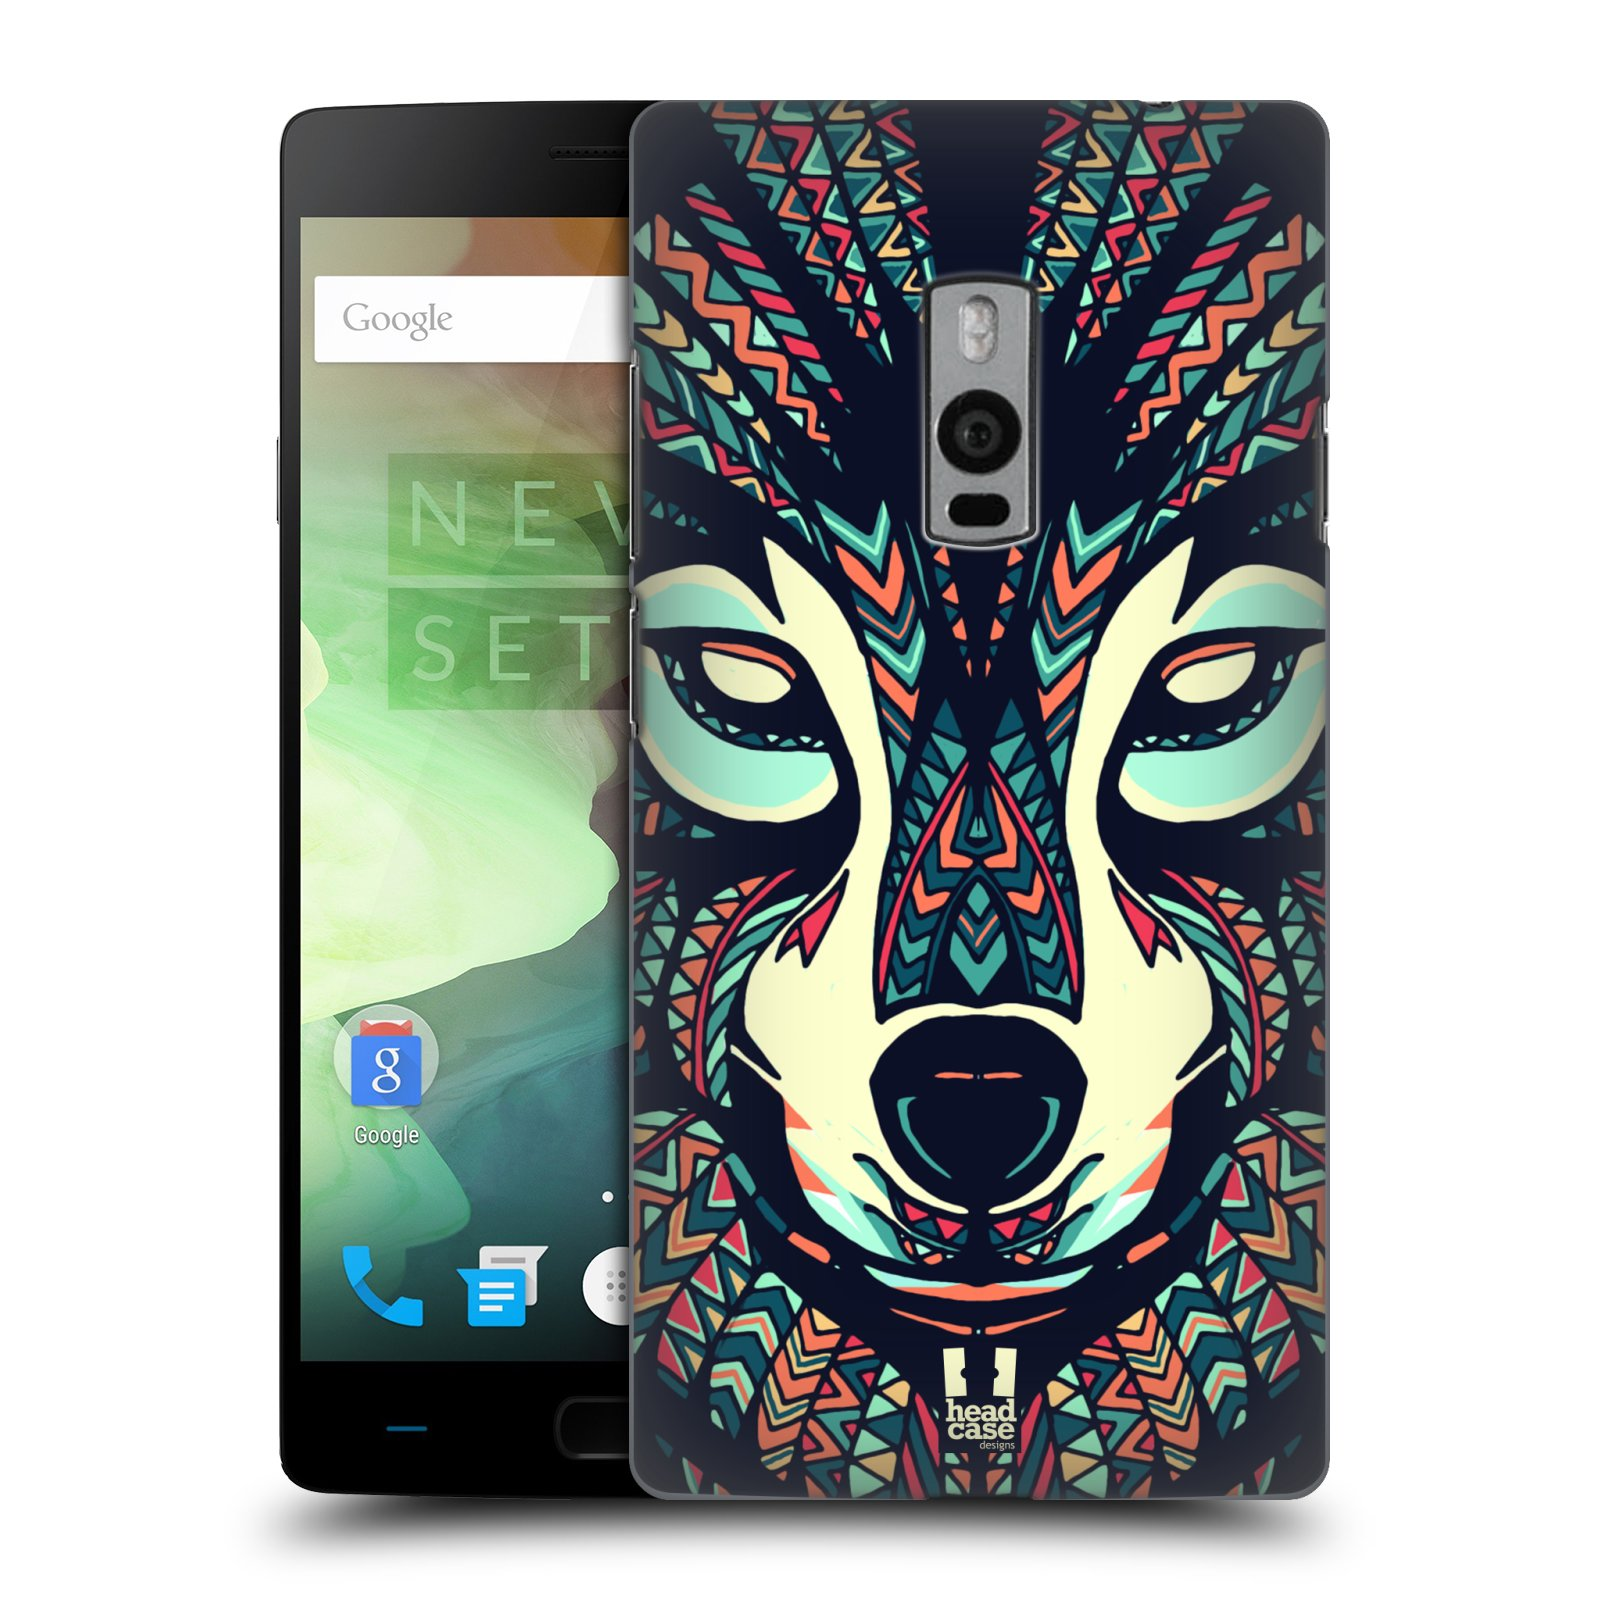 HEAD CASE pevný plastový obal na mobil OnePlus 2  ( TWO ) vzor Aztécký motiv zvíře 3 vlk